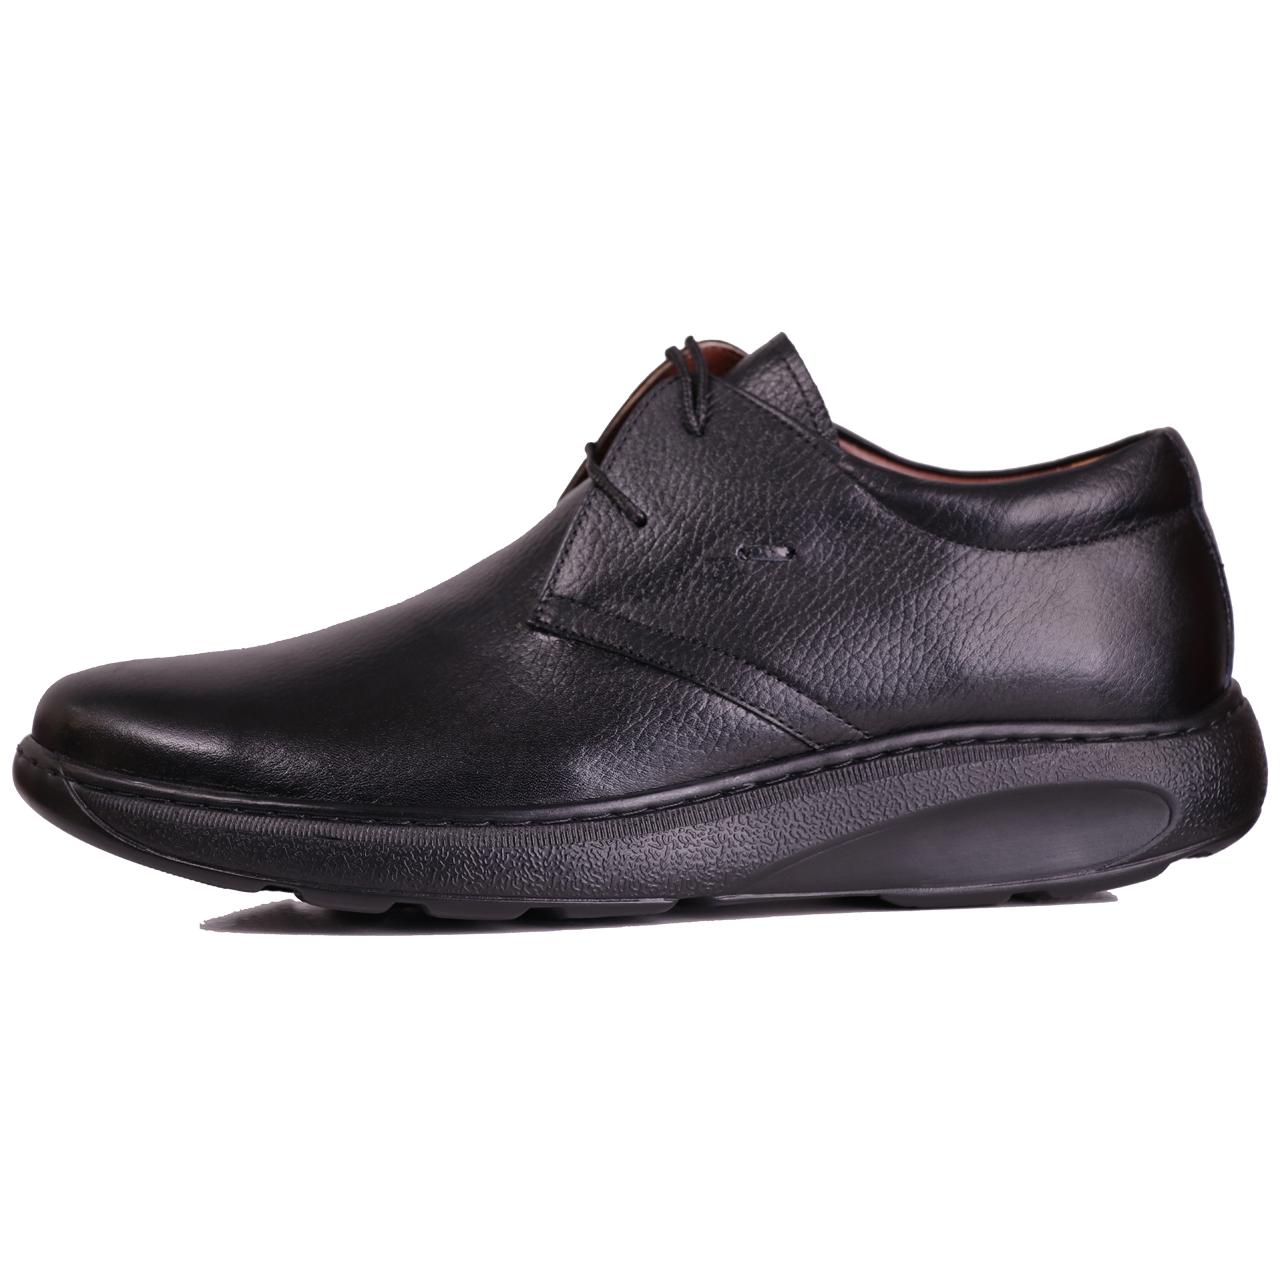 کفش مردانه چرم طبیعی ژاو مدل 2081